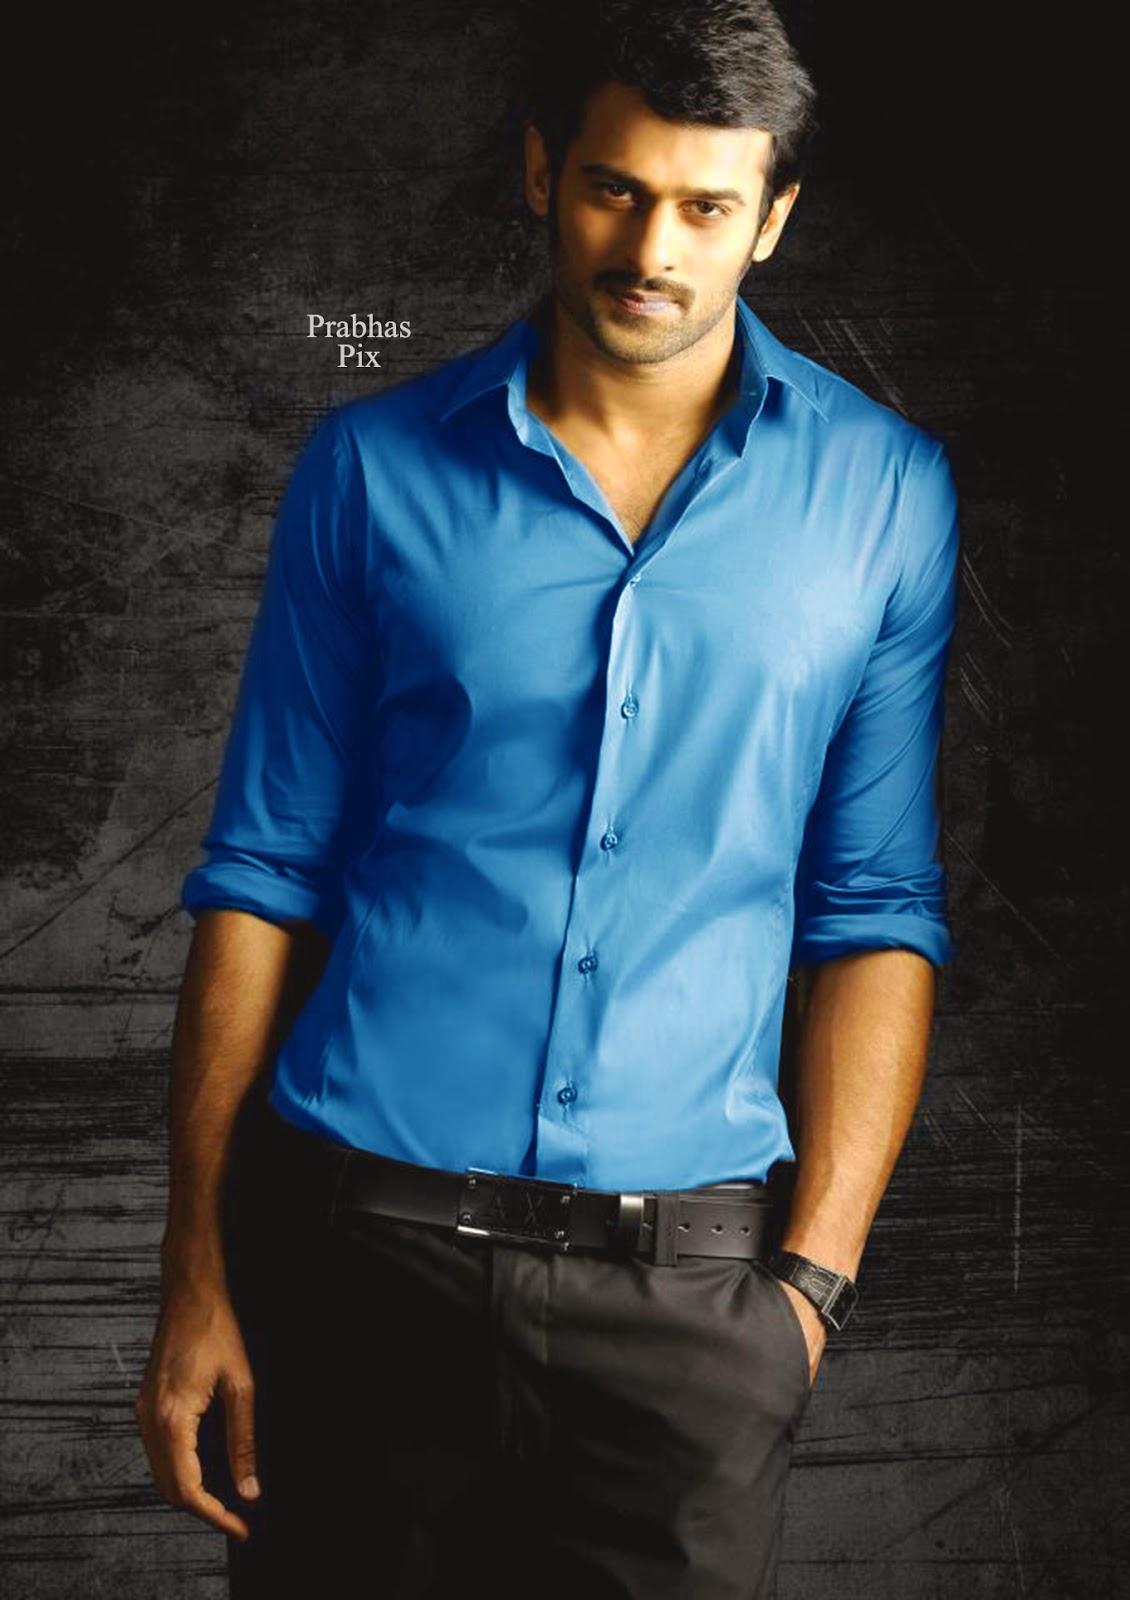 Prabhas Mirchi Wallpapers In Black Shirt